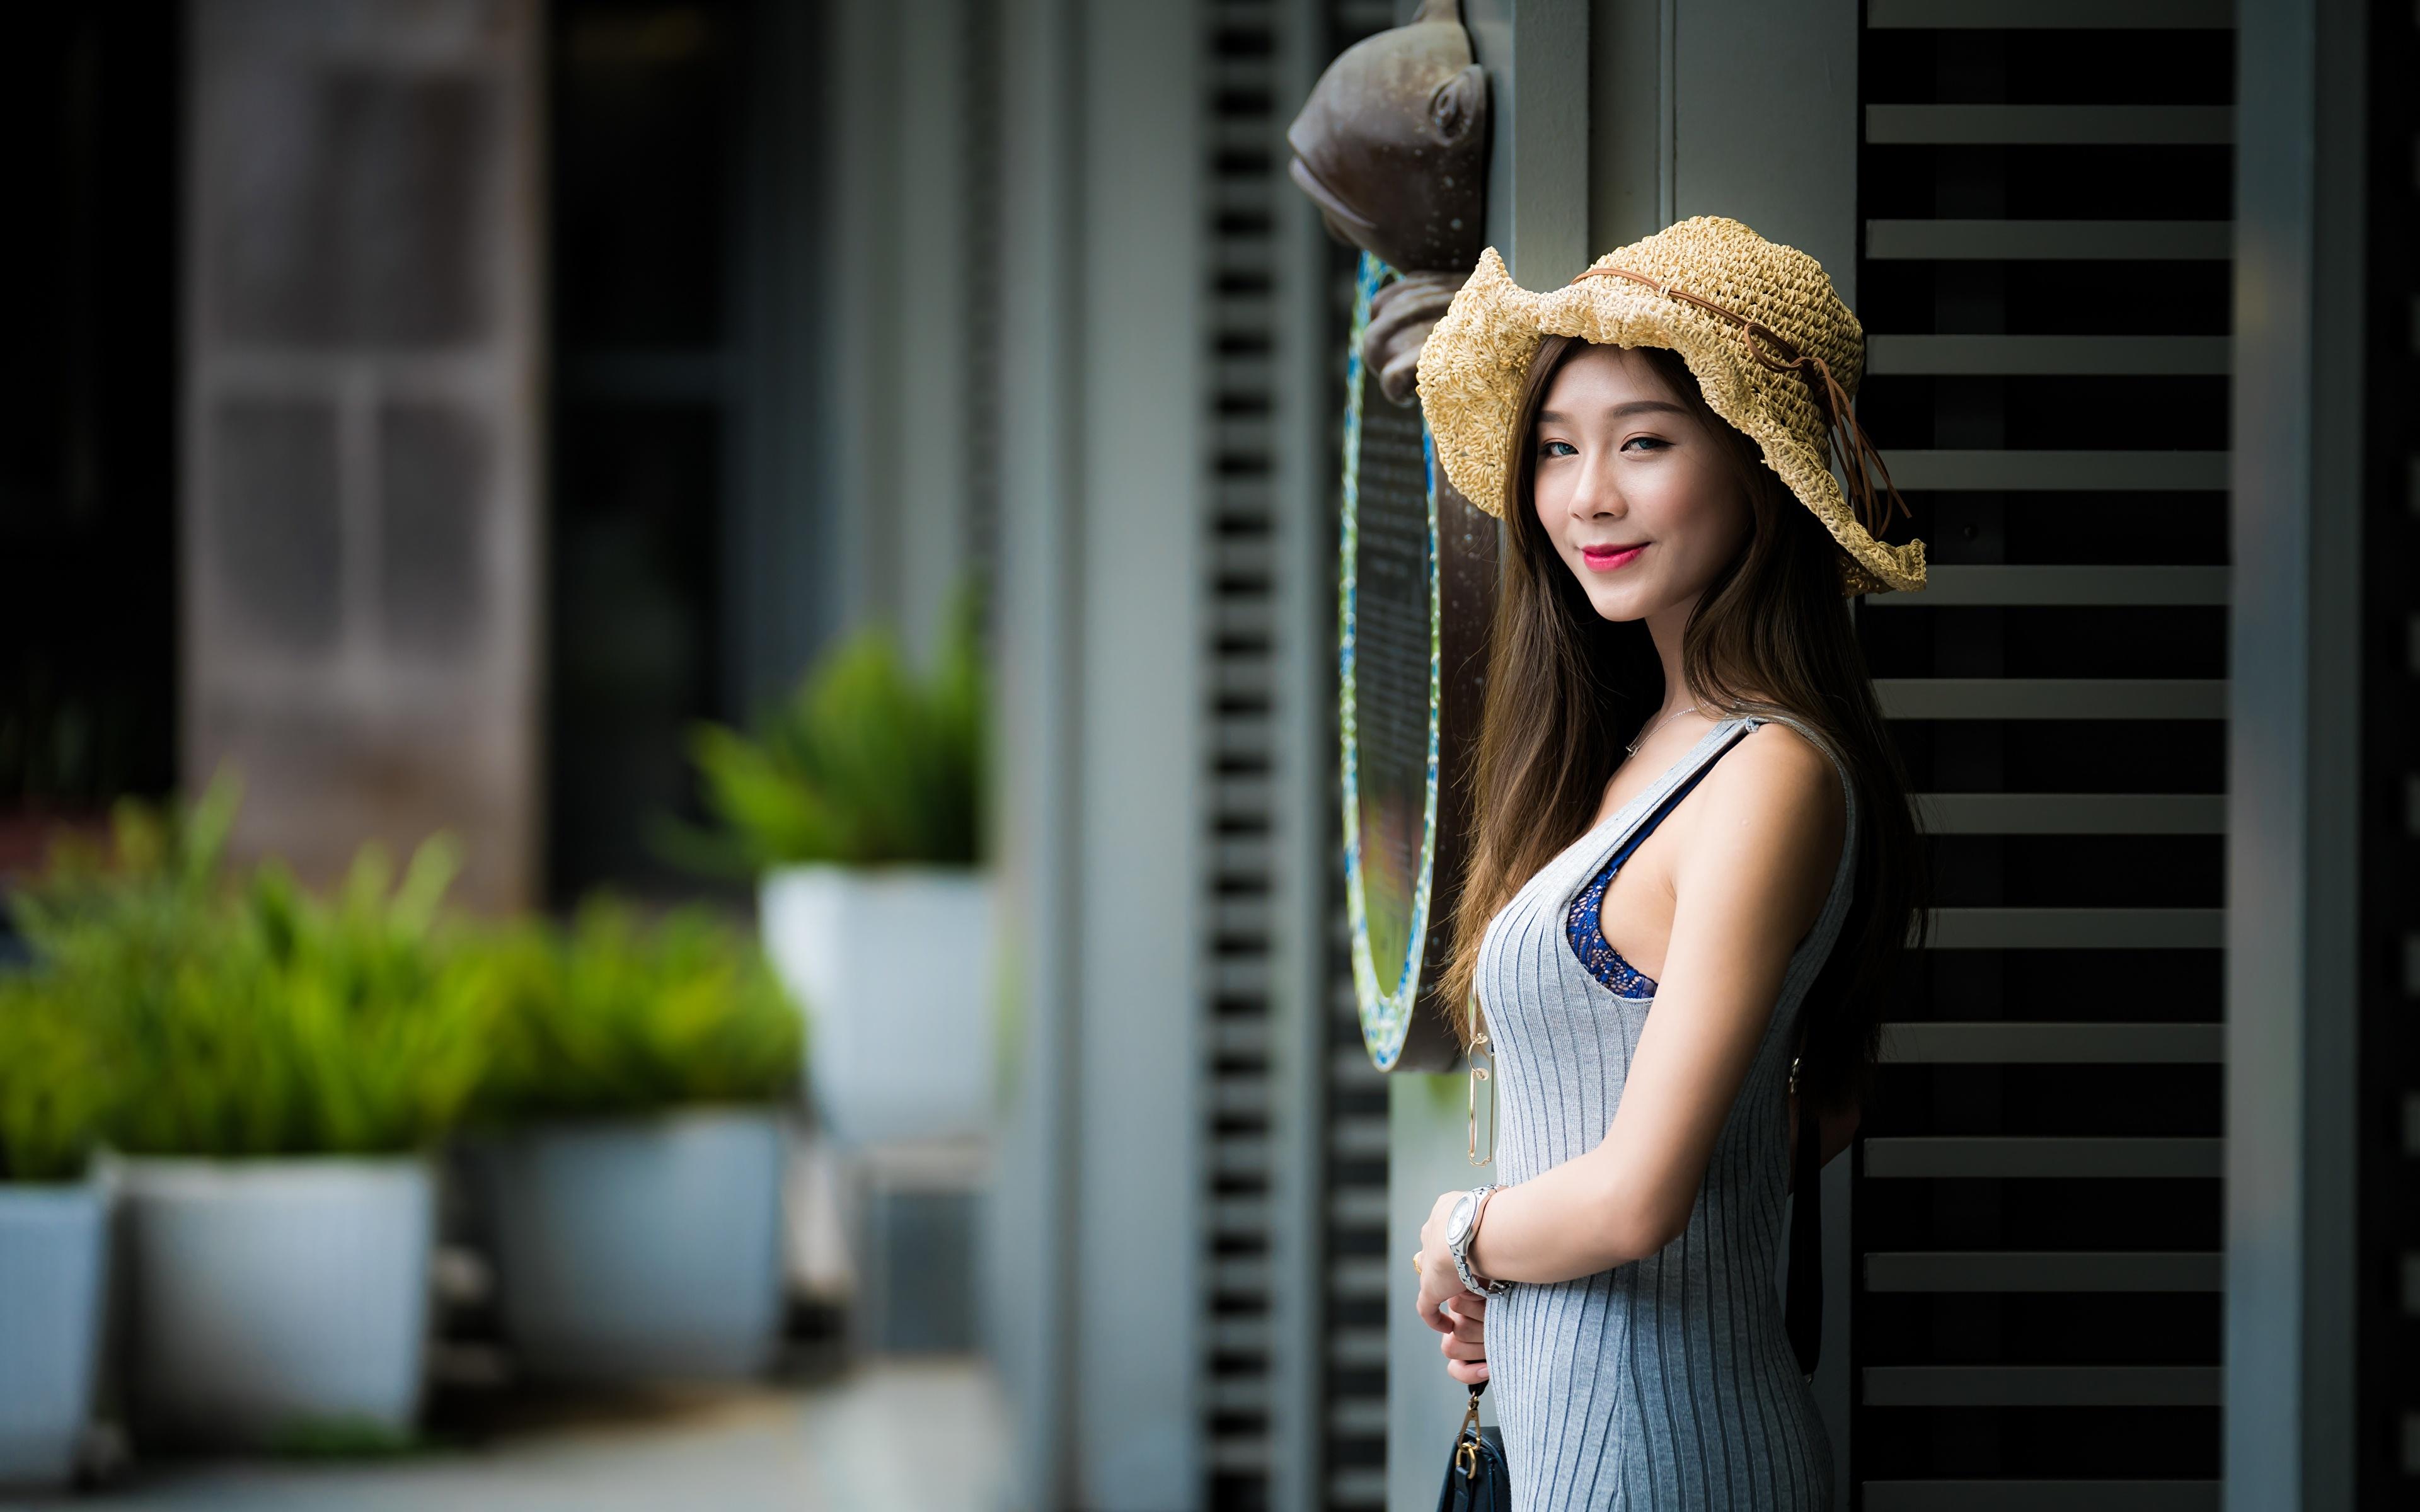 3840x2400、アジア人、ボケ写真、帽子、微笑み、手、若い女性、少女、